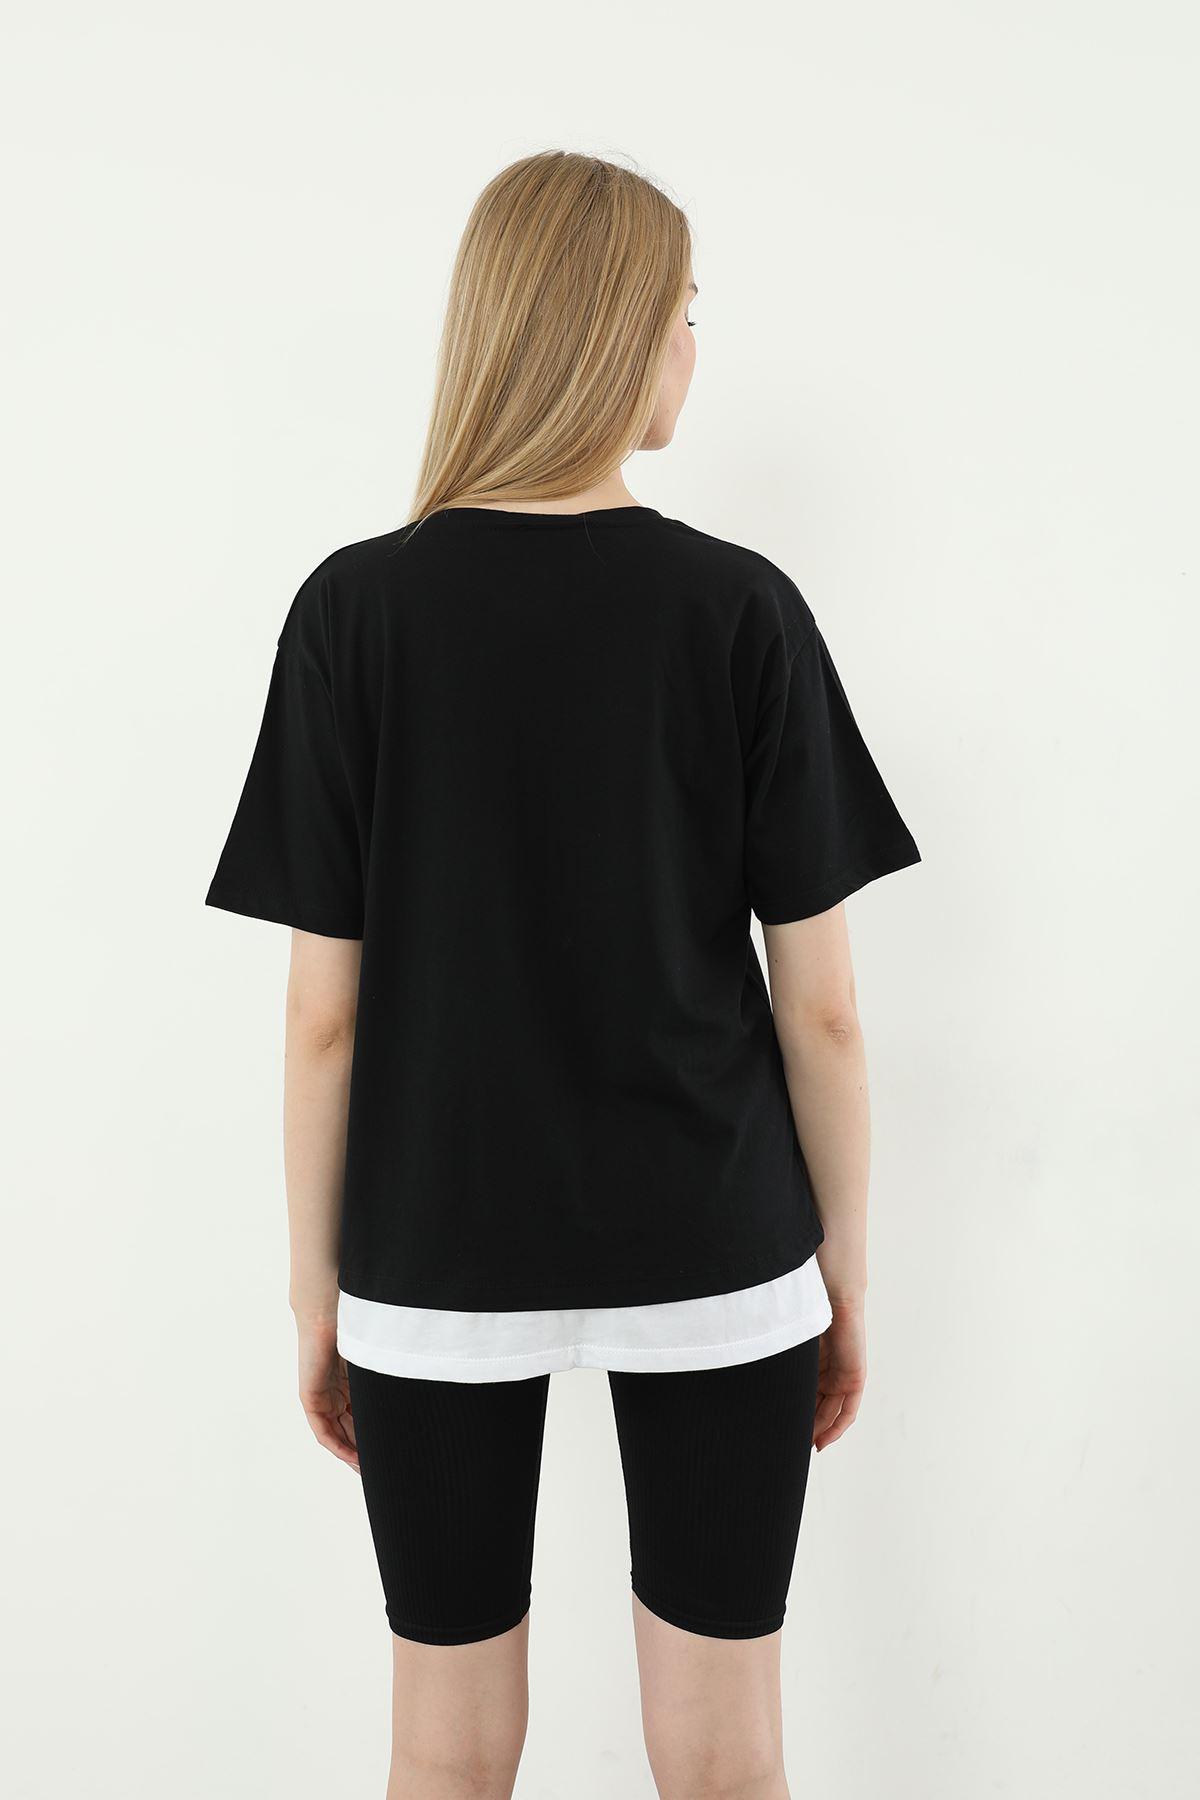 Recycle Baskılı T-shirt-Siyah